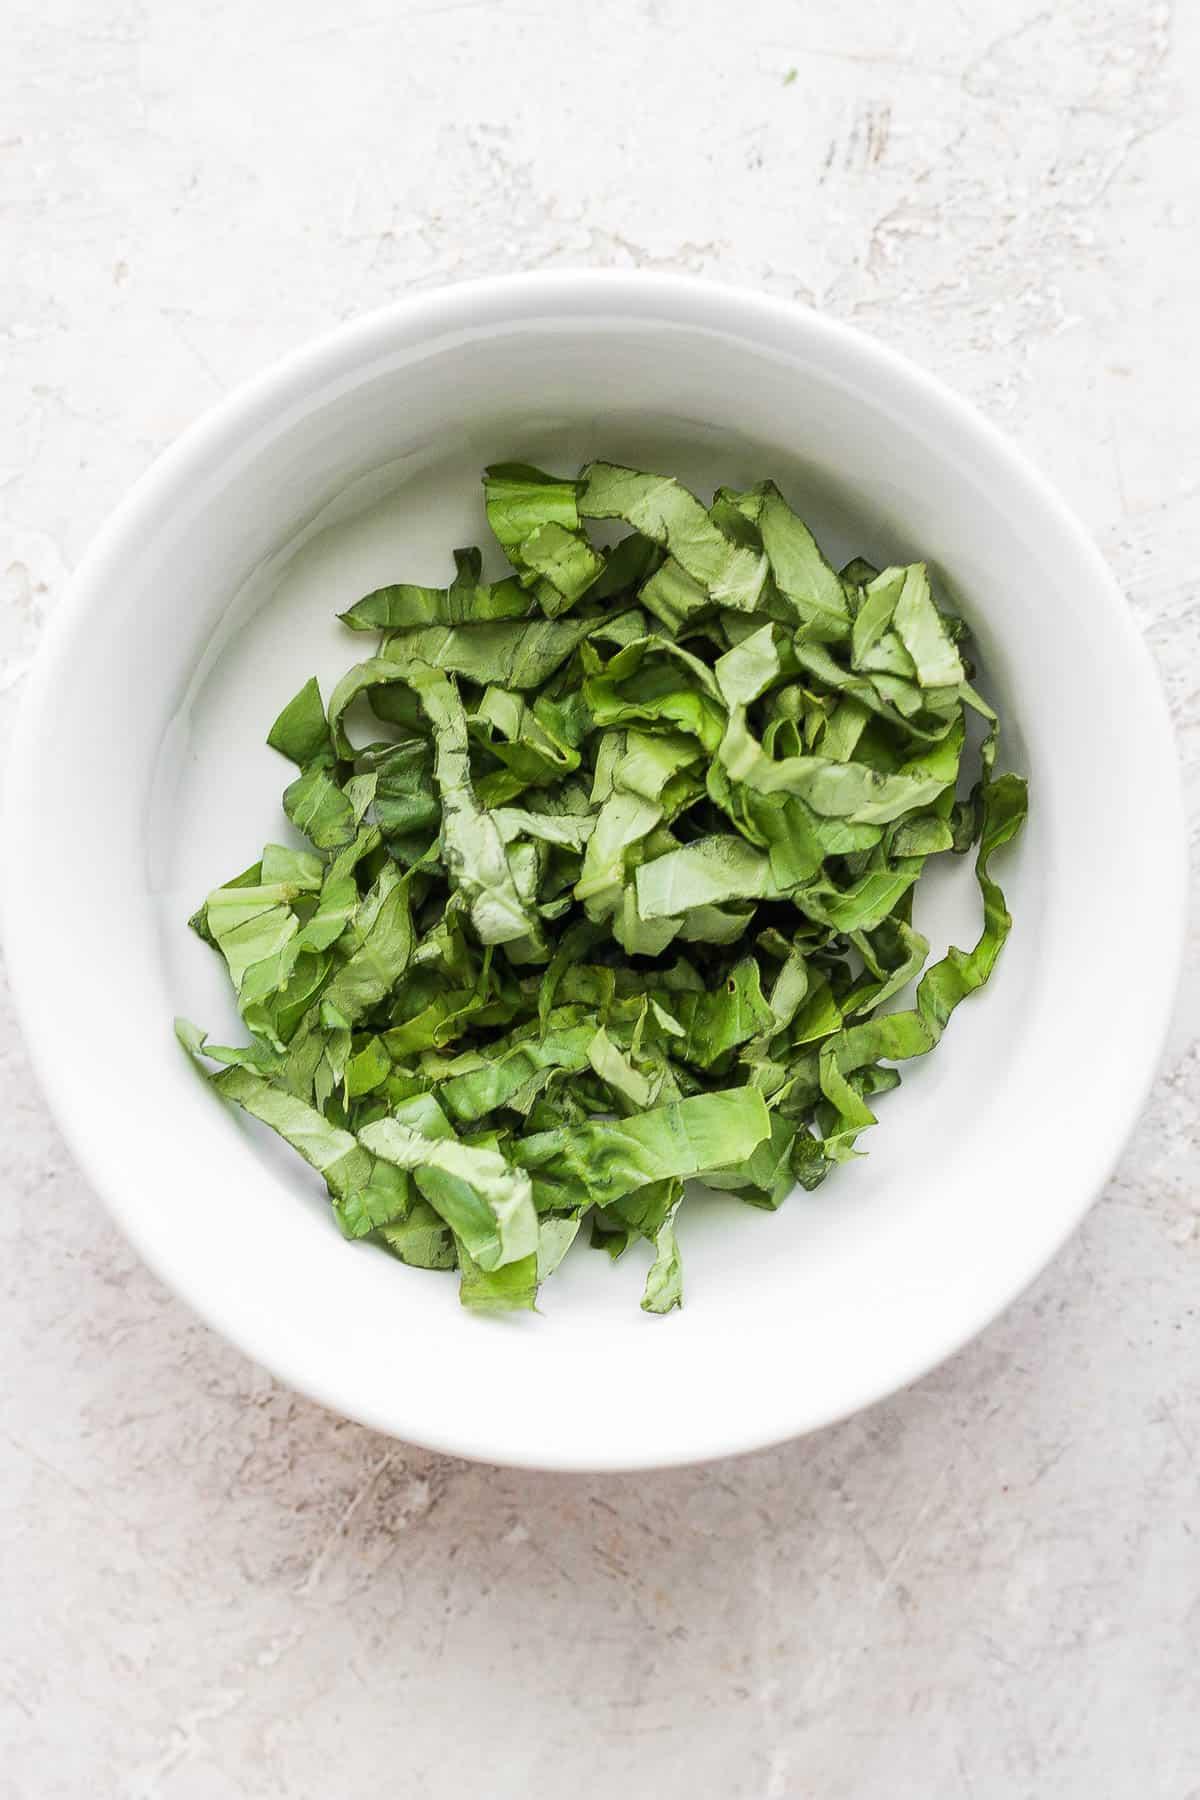 White bowl of chiffonade basil